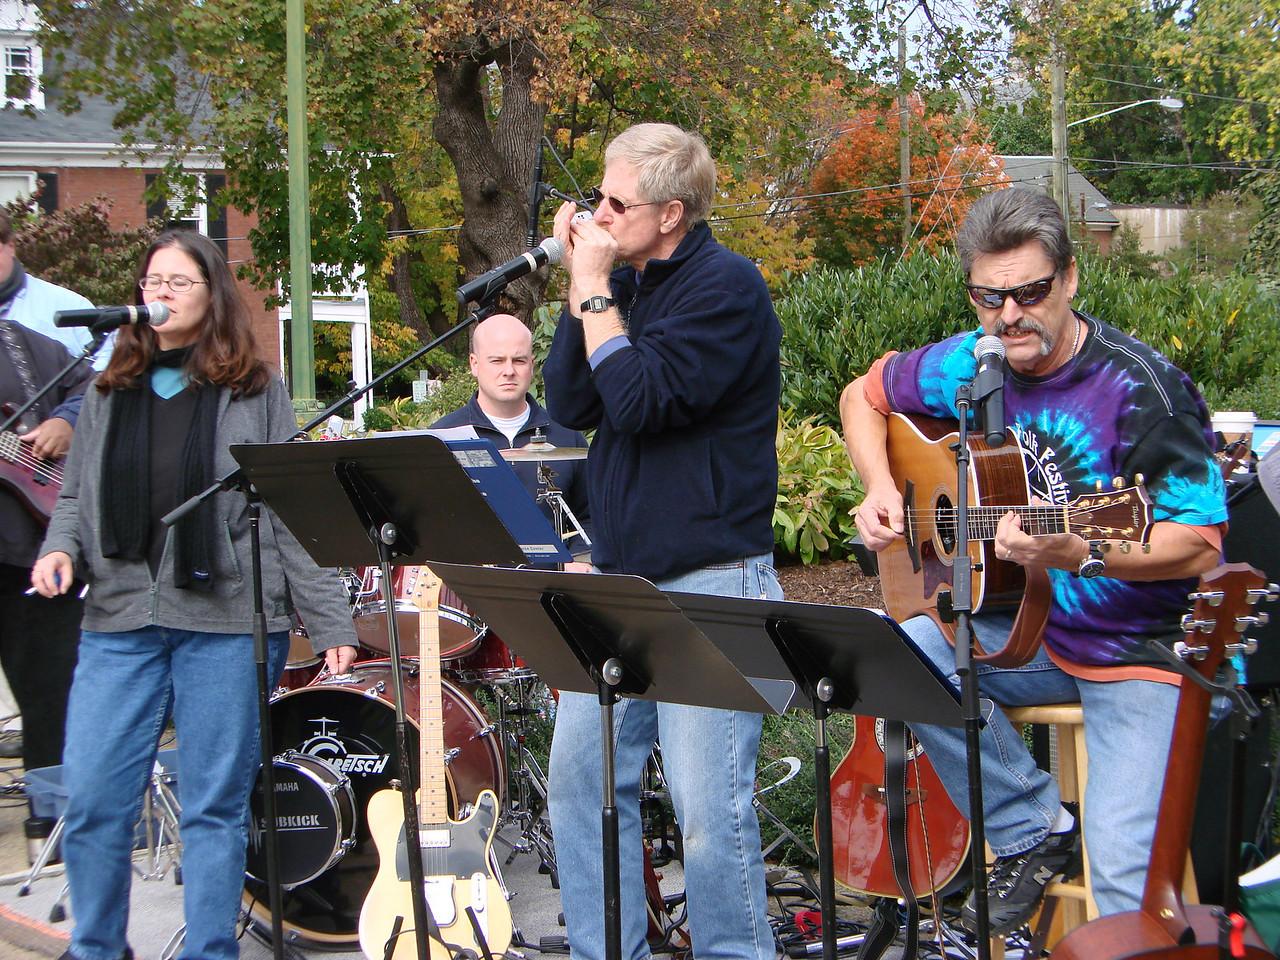 Park Street Christian Church Praise Band share their gift of music